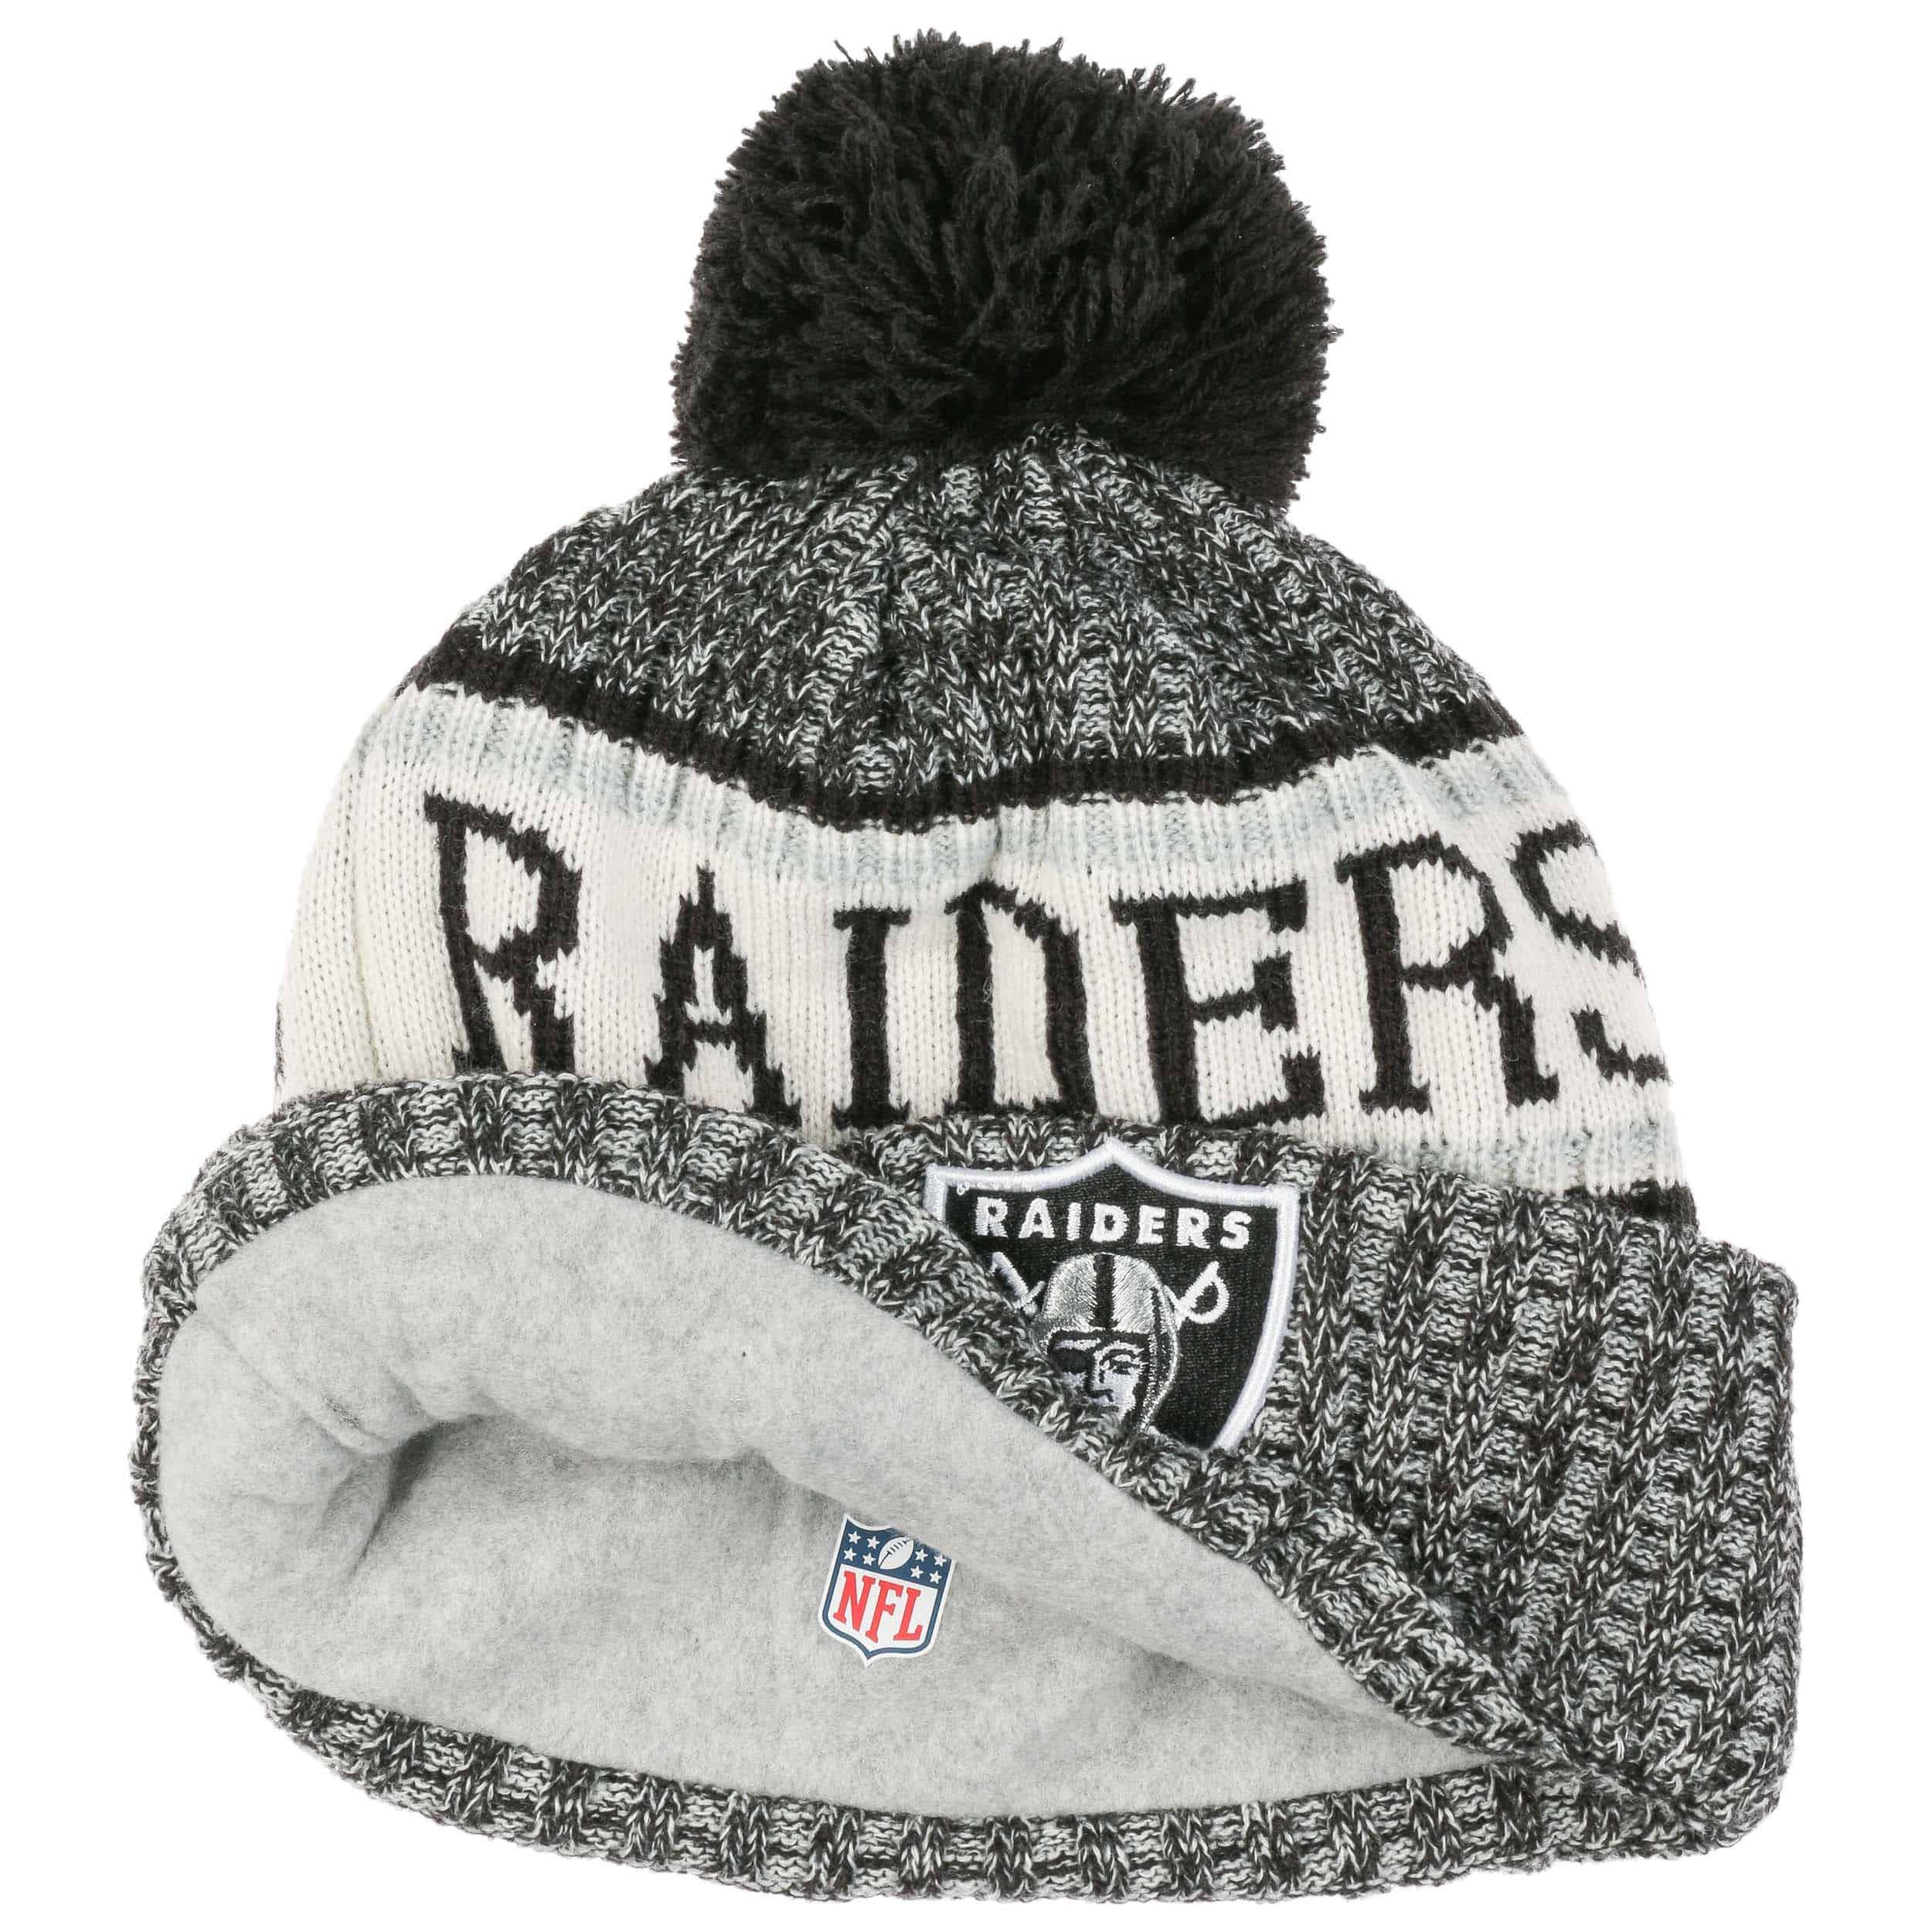 1c1d1966b742e On-Field 18 Raiders Beanie Hat by New Era - black 1 ...